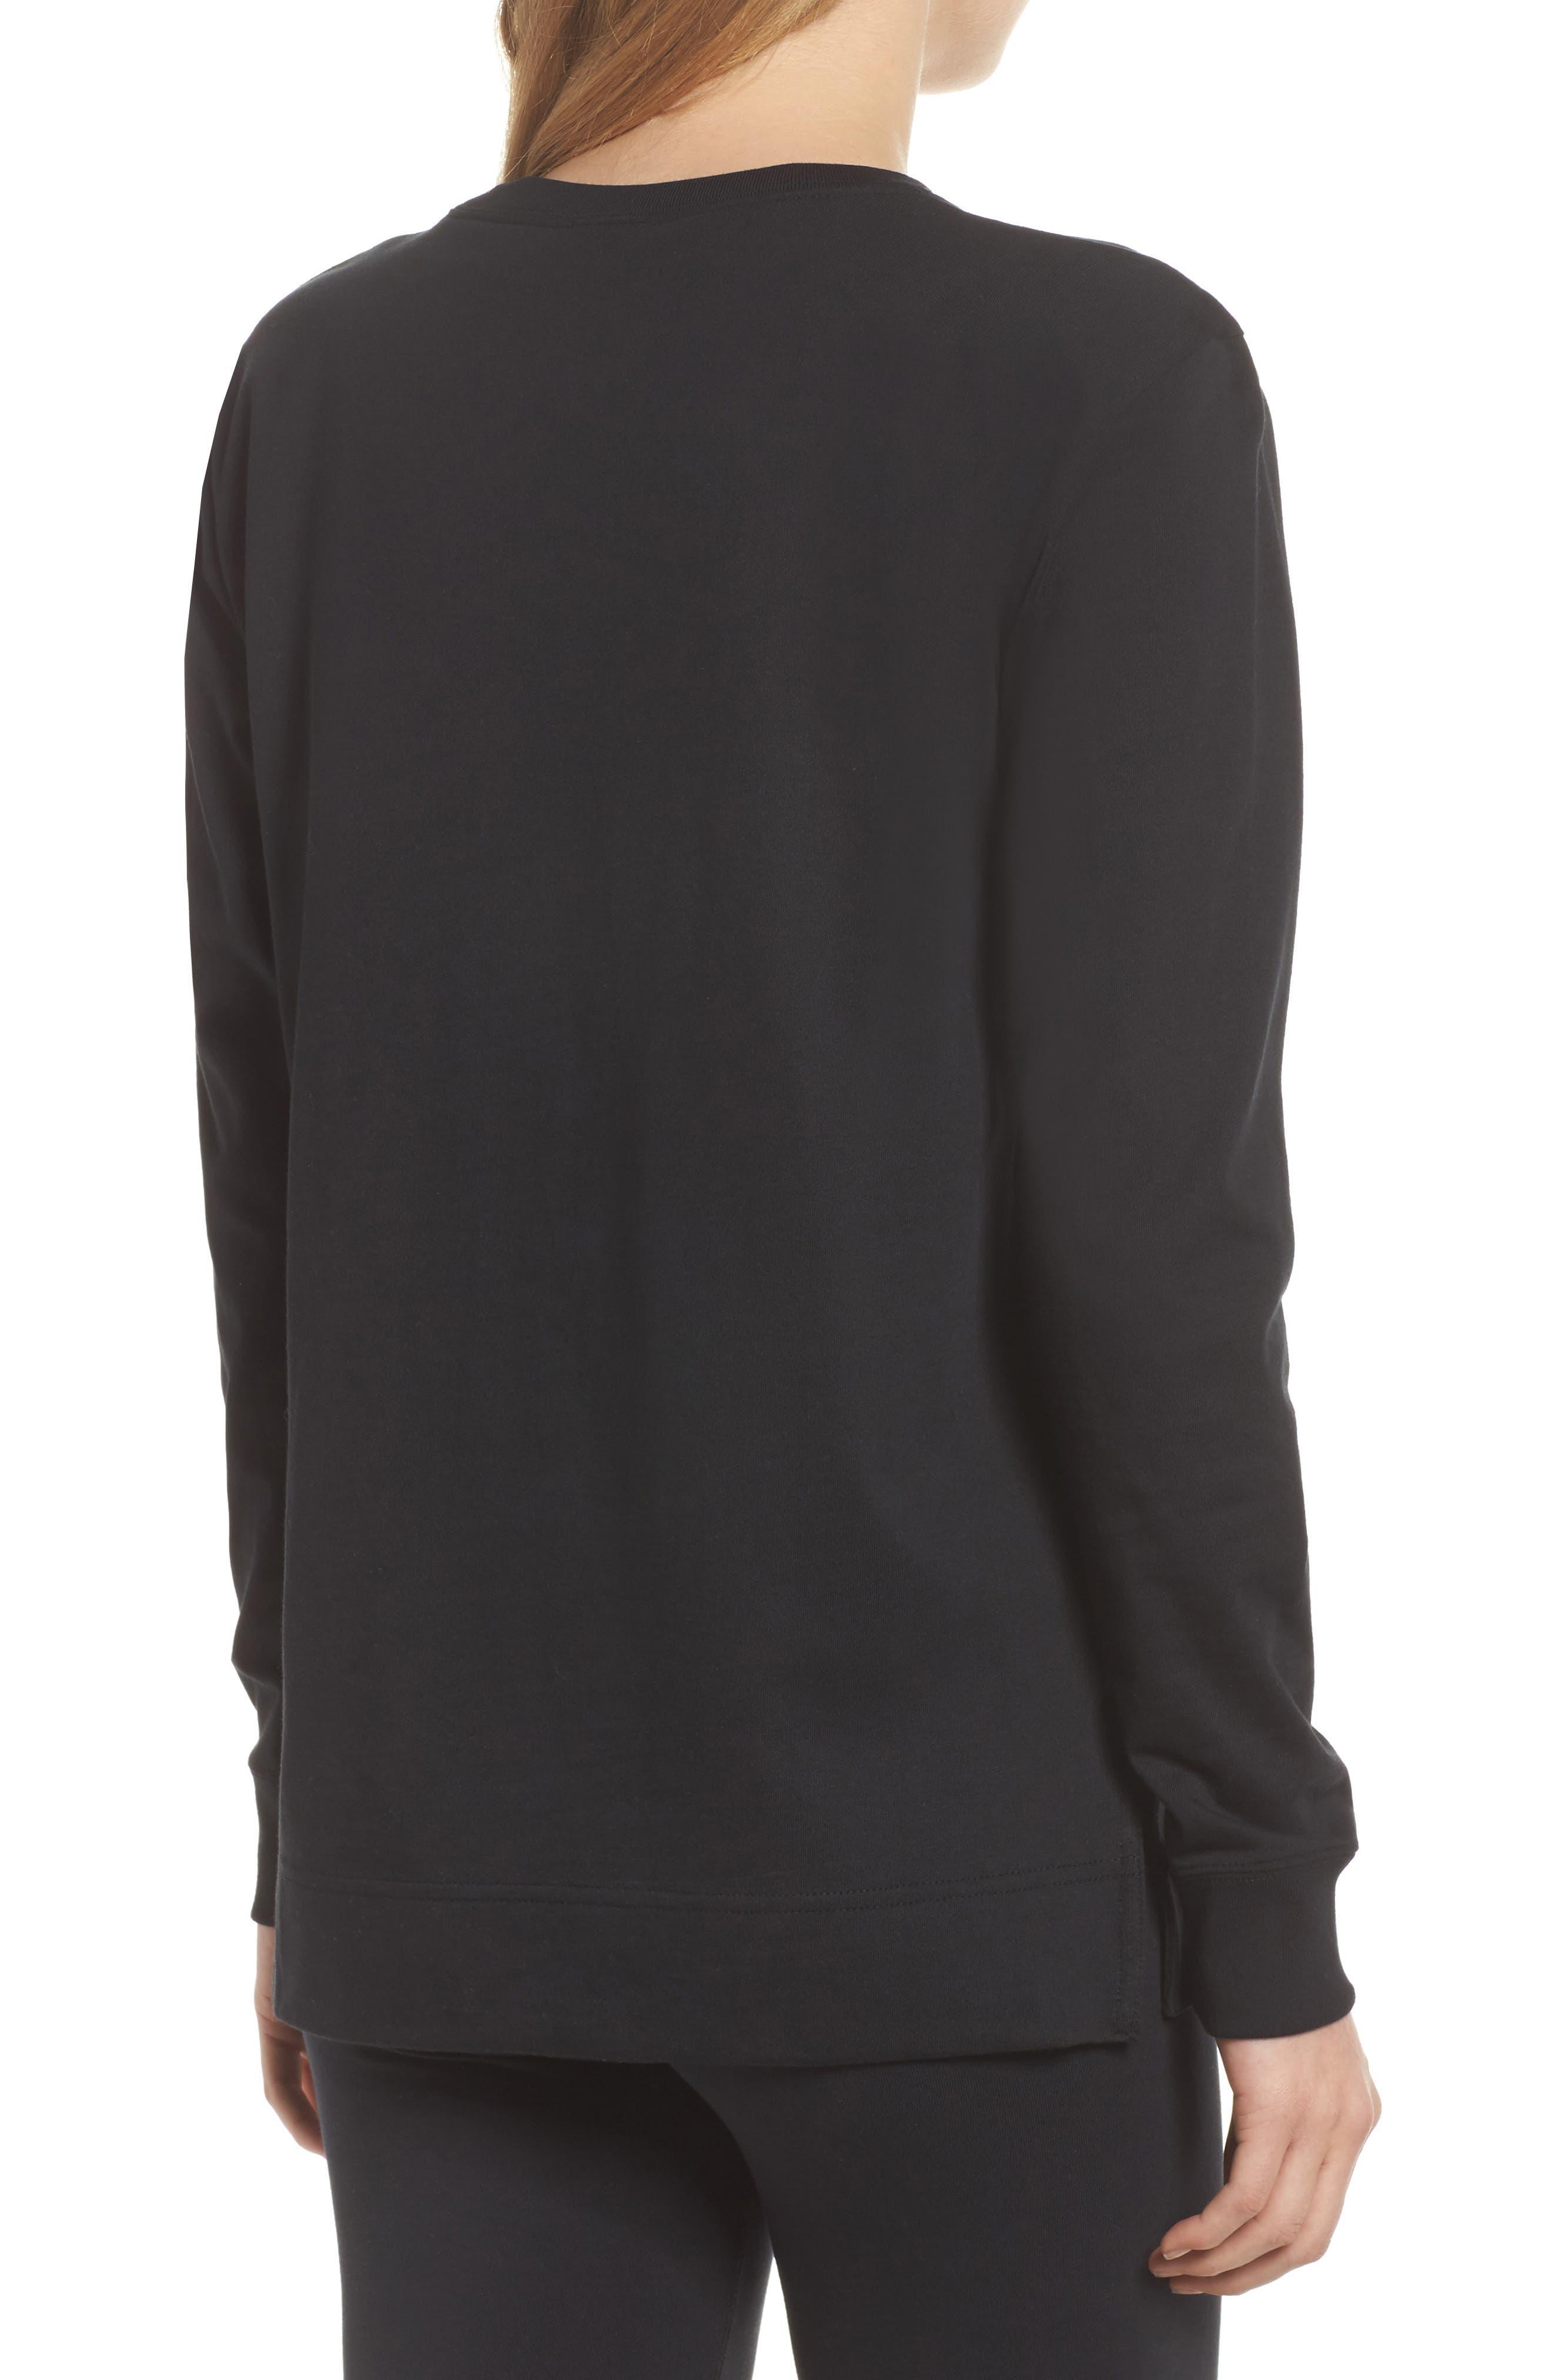 Sportswear HBR Women's Long Sleeve Tee,                             Alternate thumbnail 4, color,                             010